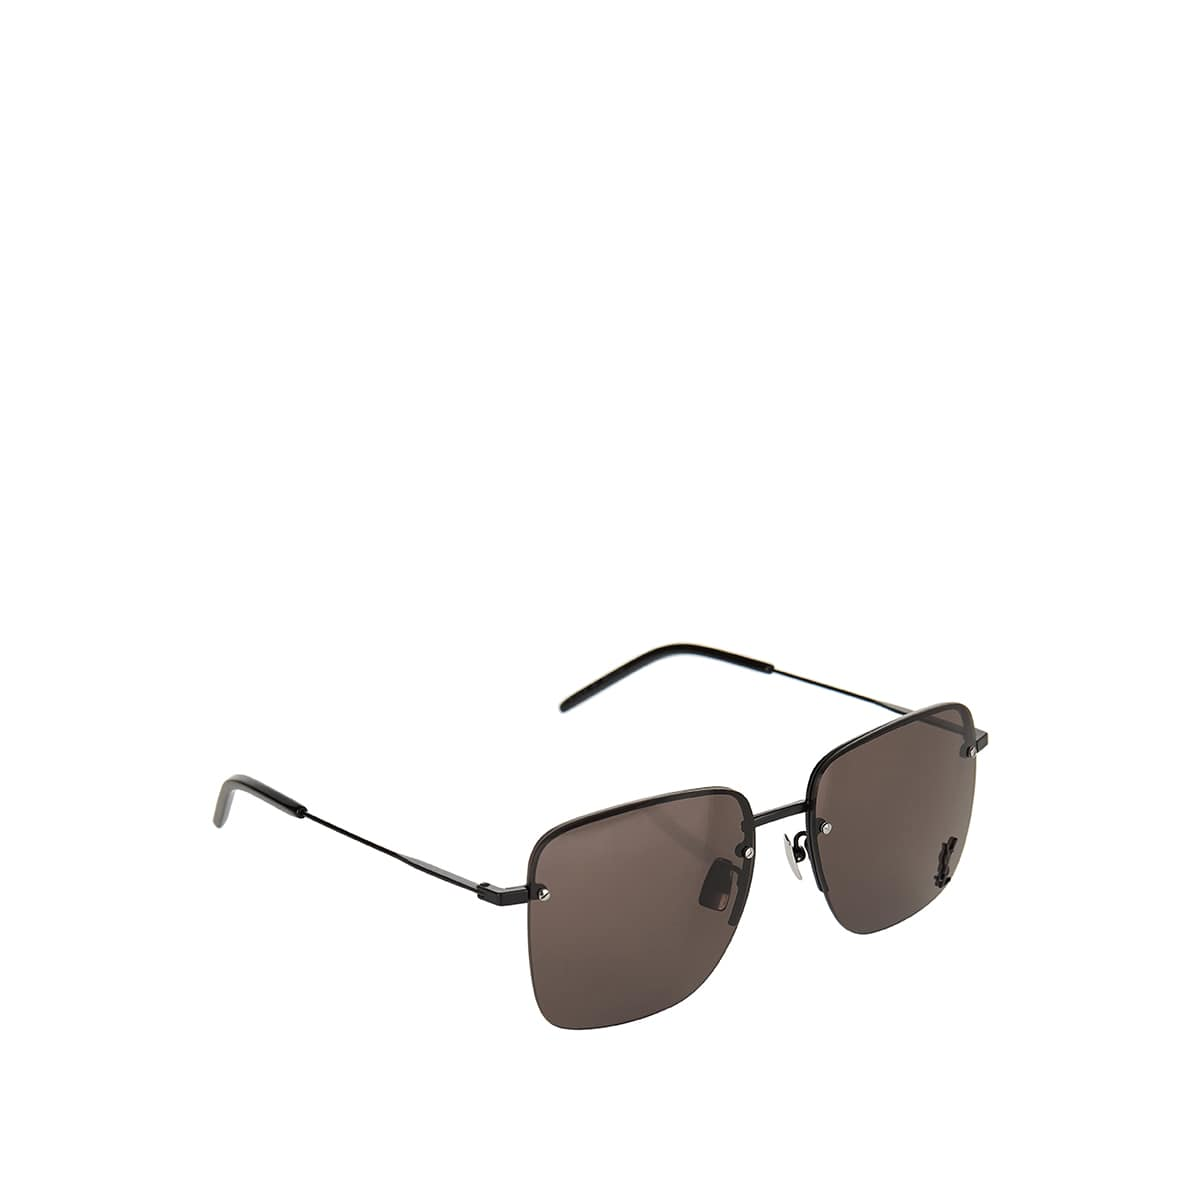 SL 312 Monogram metal sunglasses